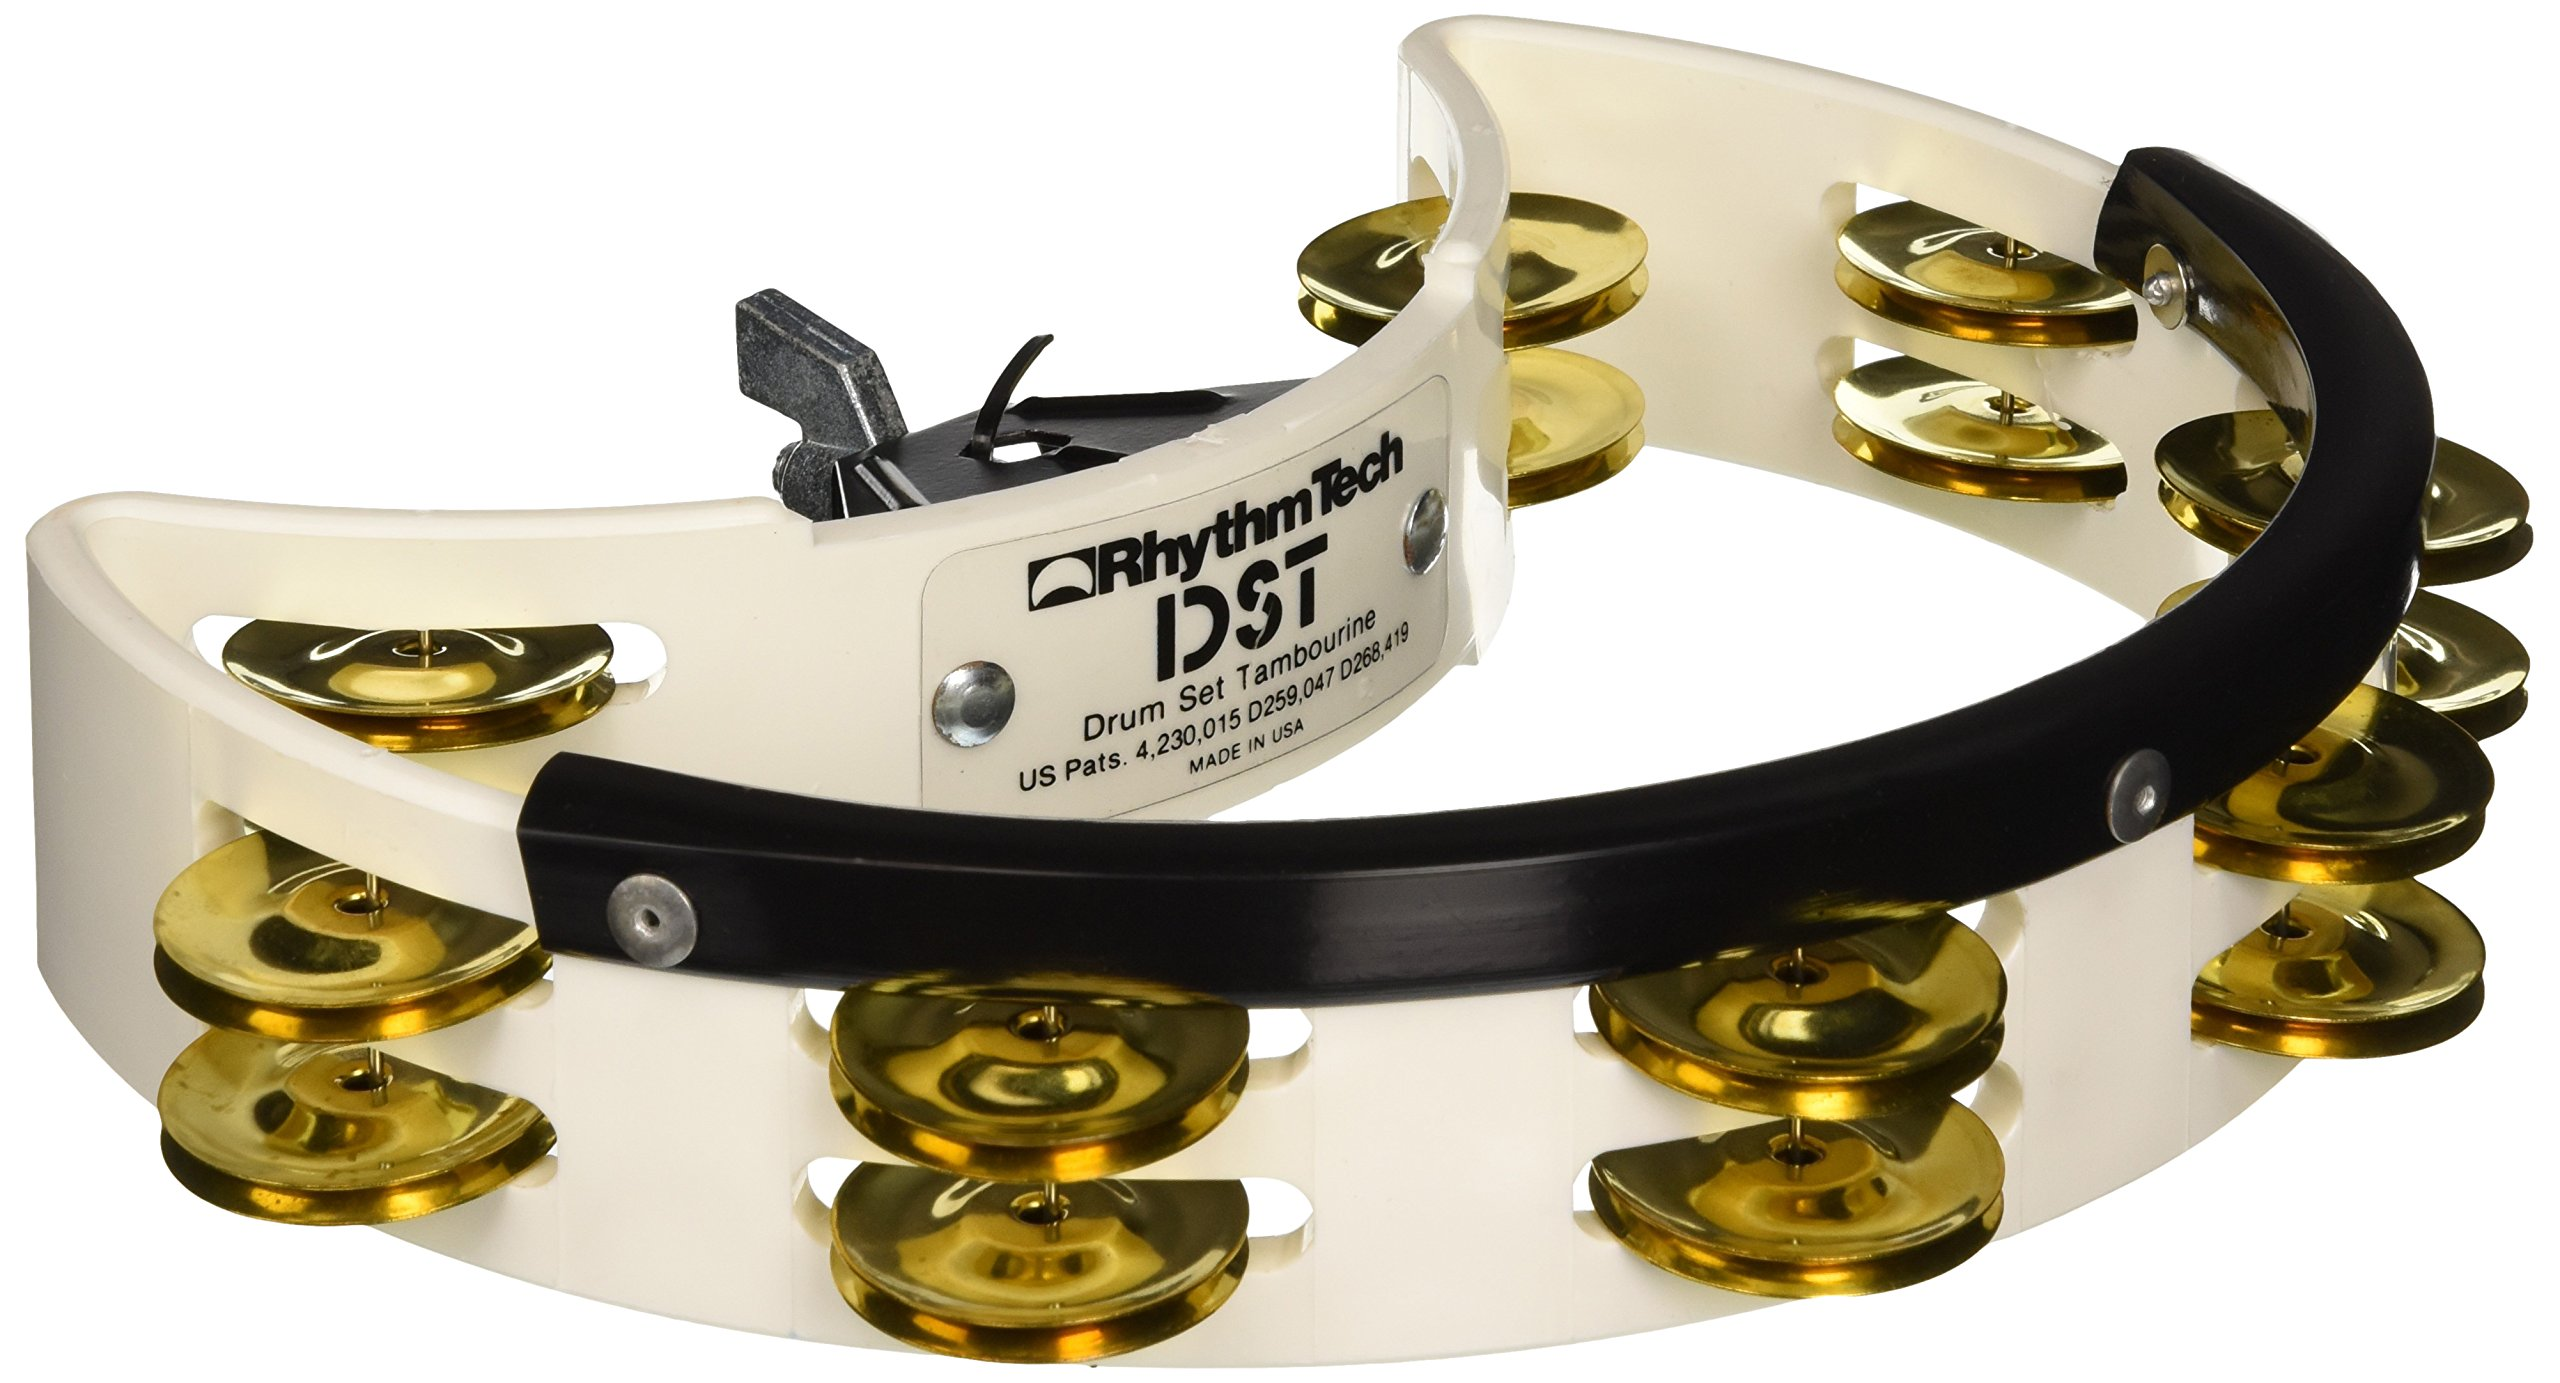 Rhythm Tech DST 21 Drum Set Tambourine-White-Brass Jingles by Rhythm Tech (Image #1)